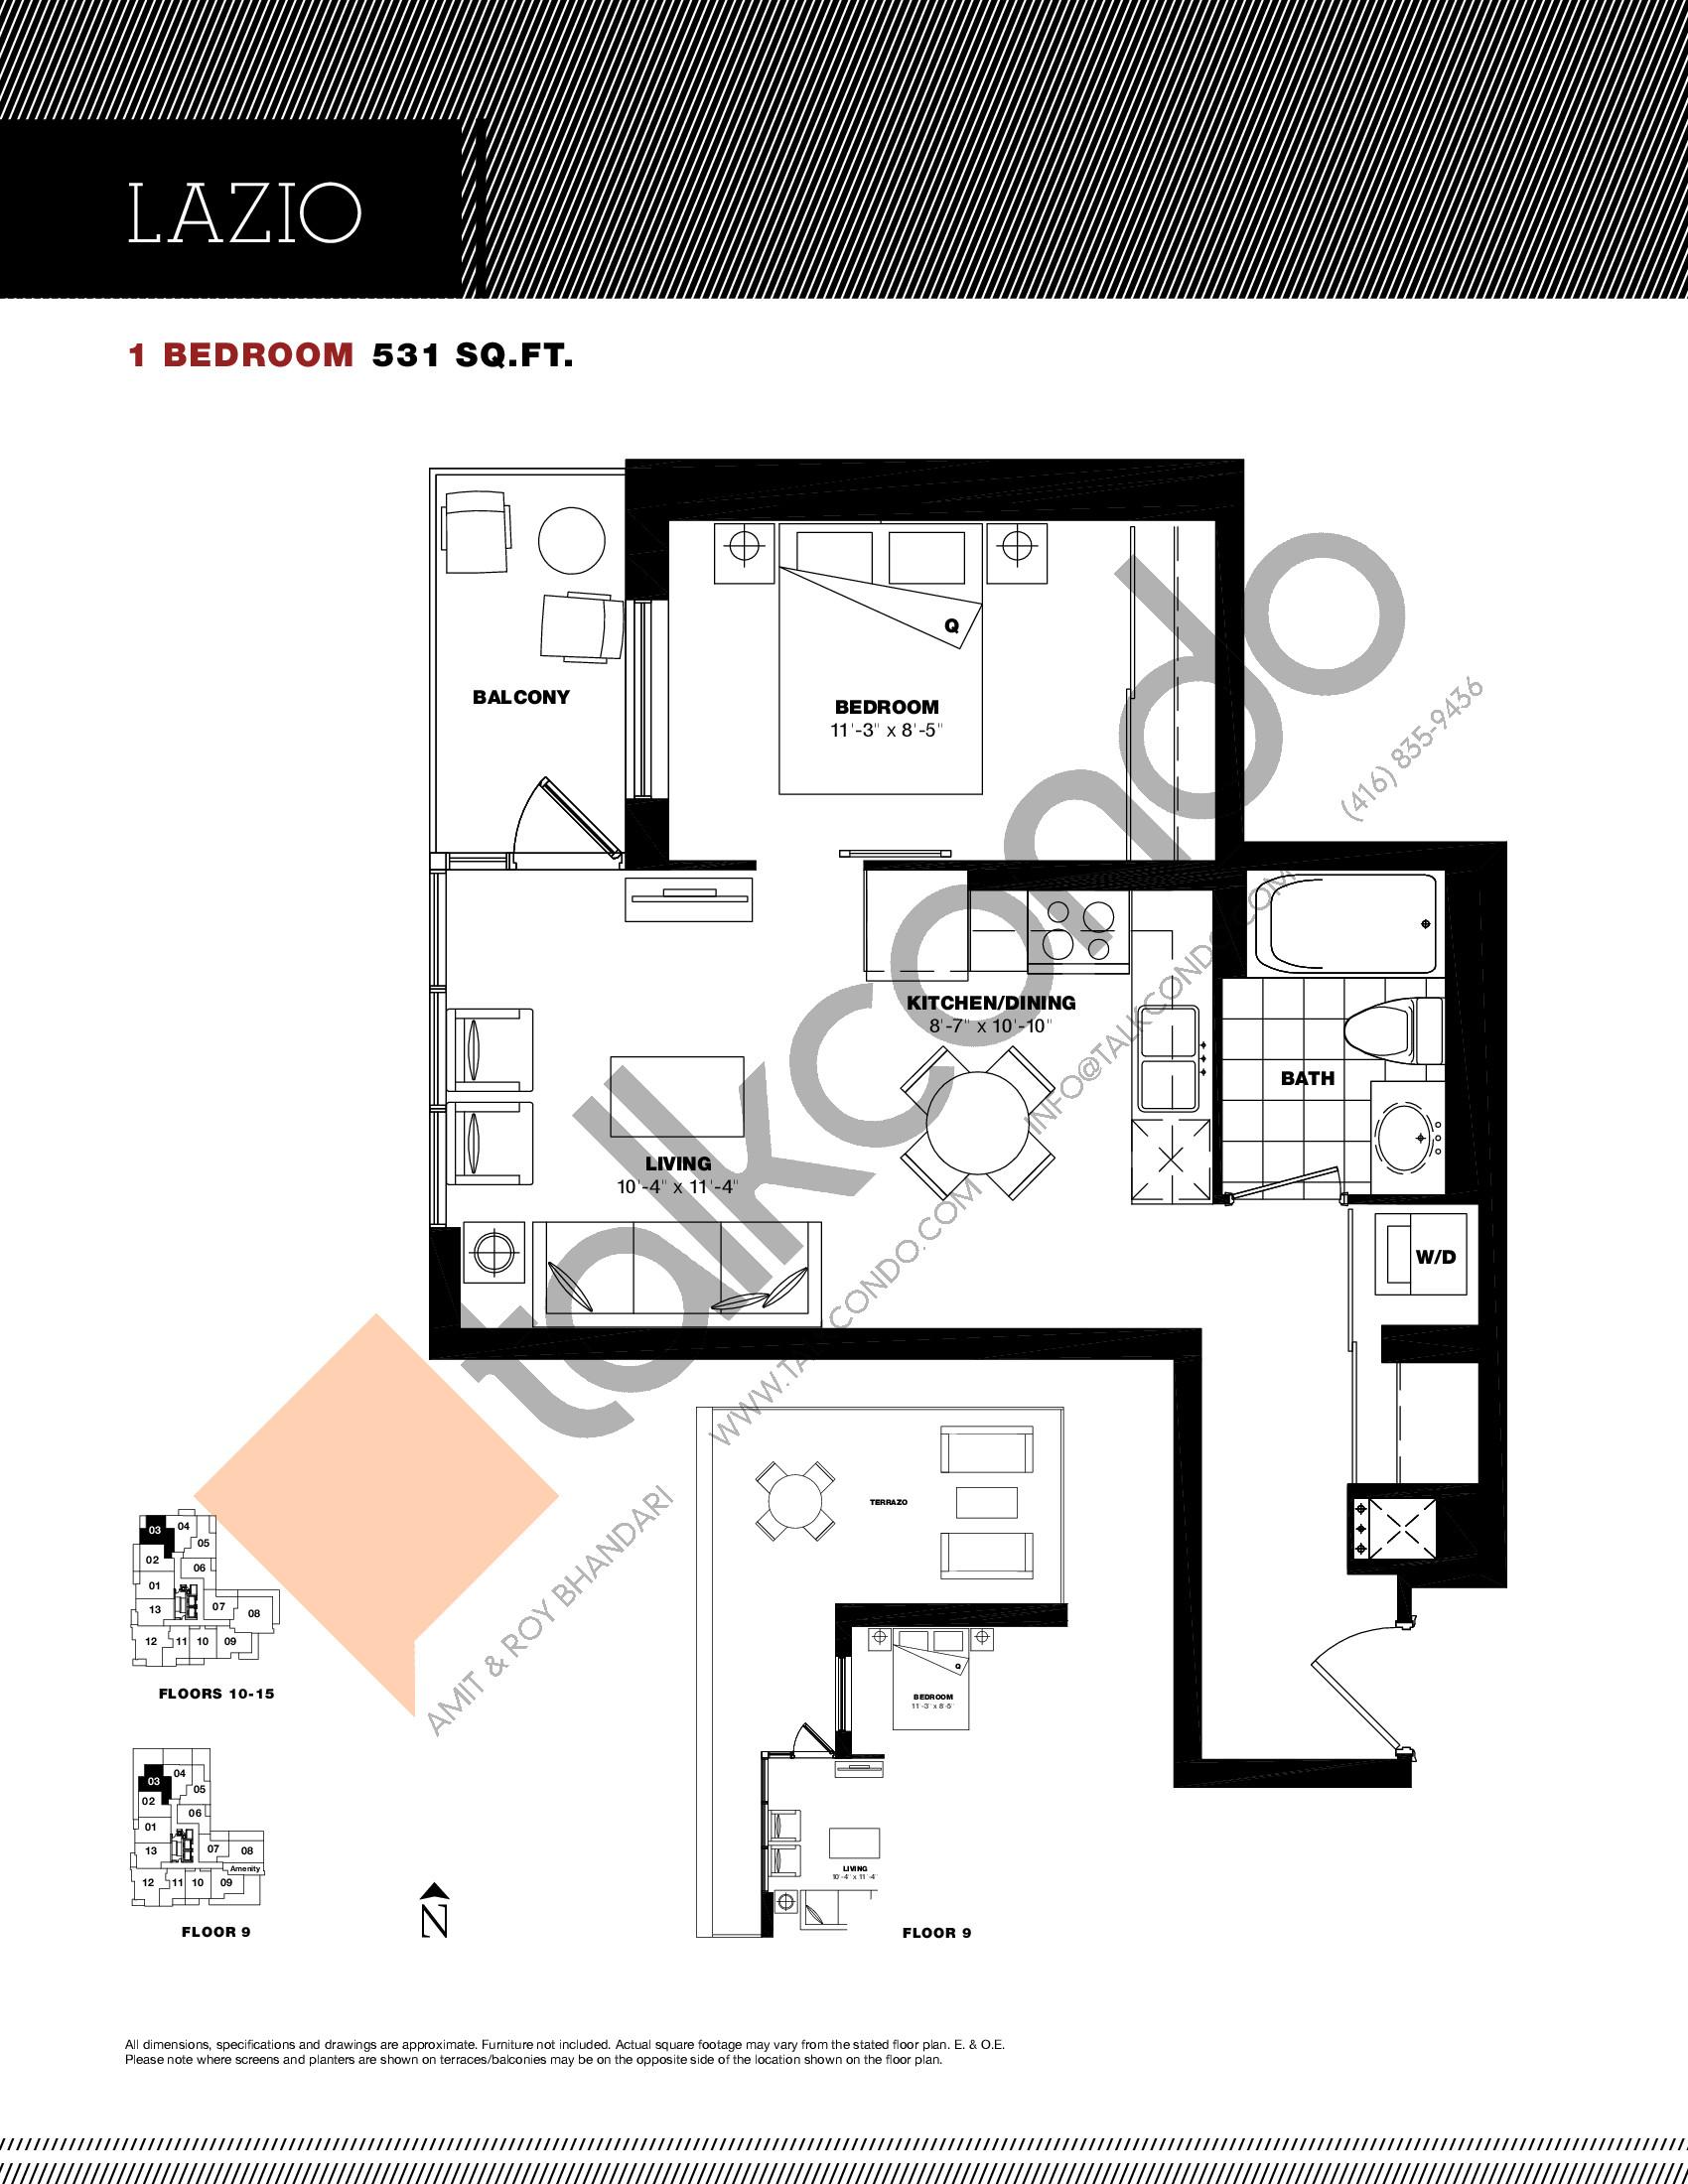 Lazio Floor Plan at Residenze Palazzo at Treviso 3 Condos - 531 sq.ft